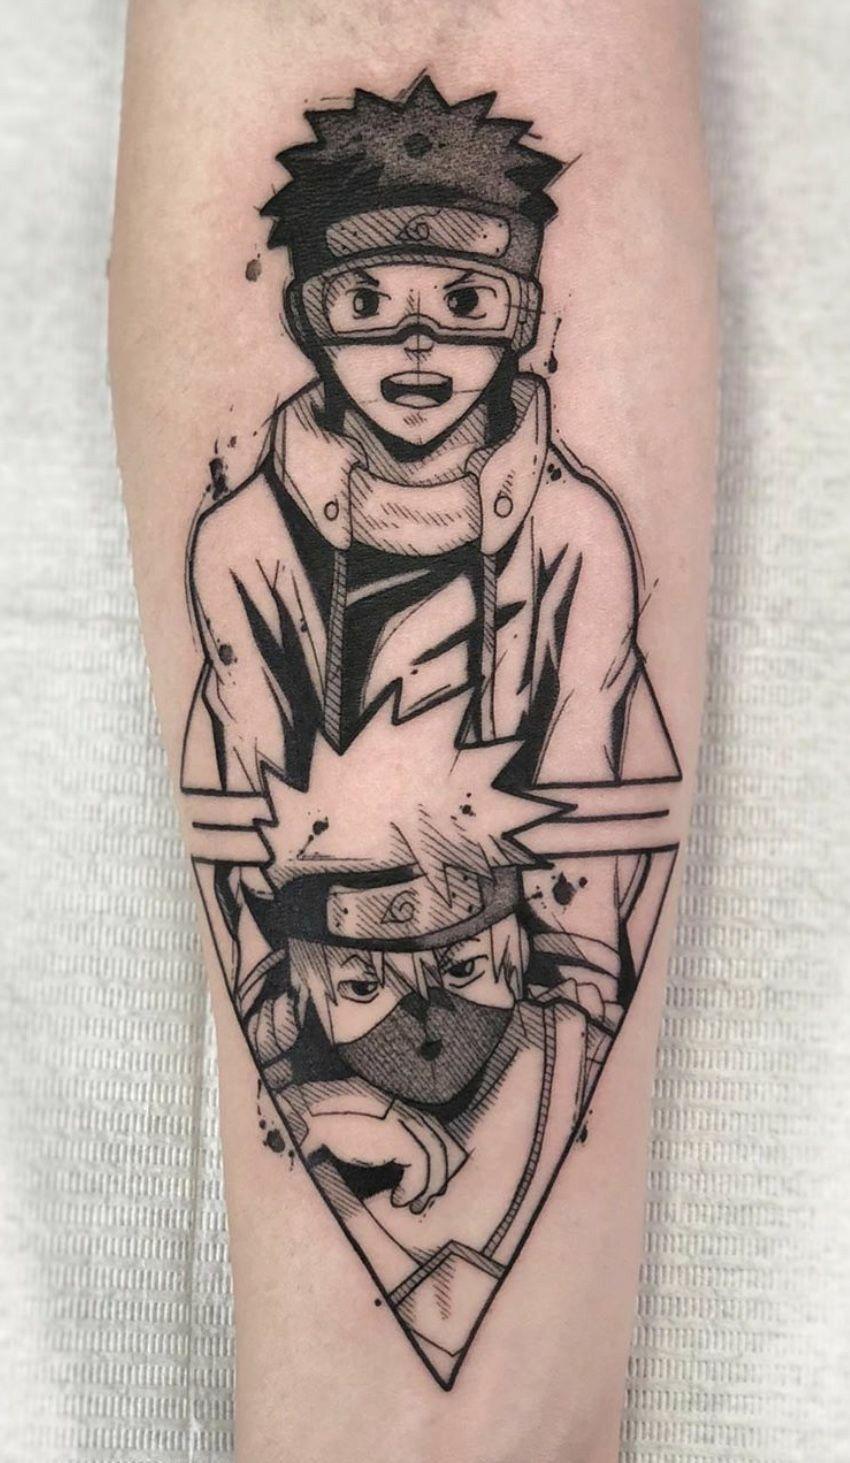 Top 30 Anime Tattoo Ideas Design For Man Naruto Tattoo Anime Tattoos Manga Tattoo